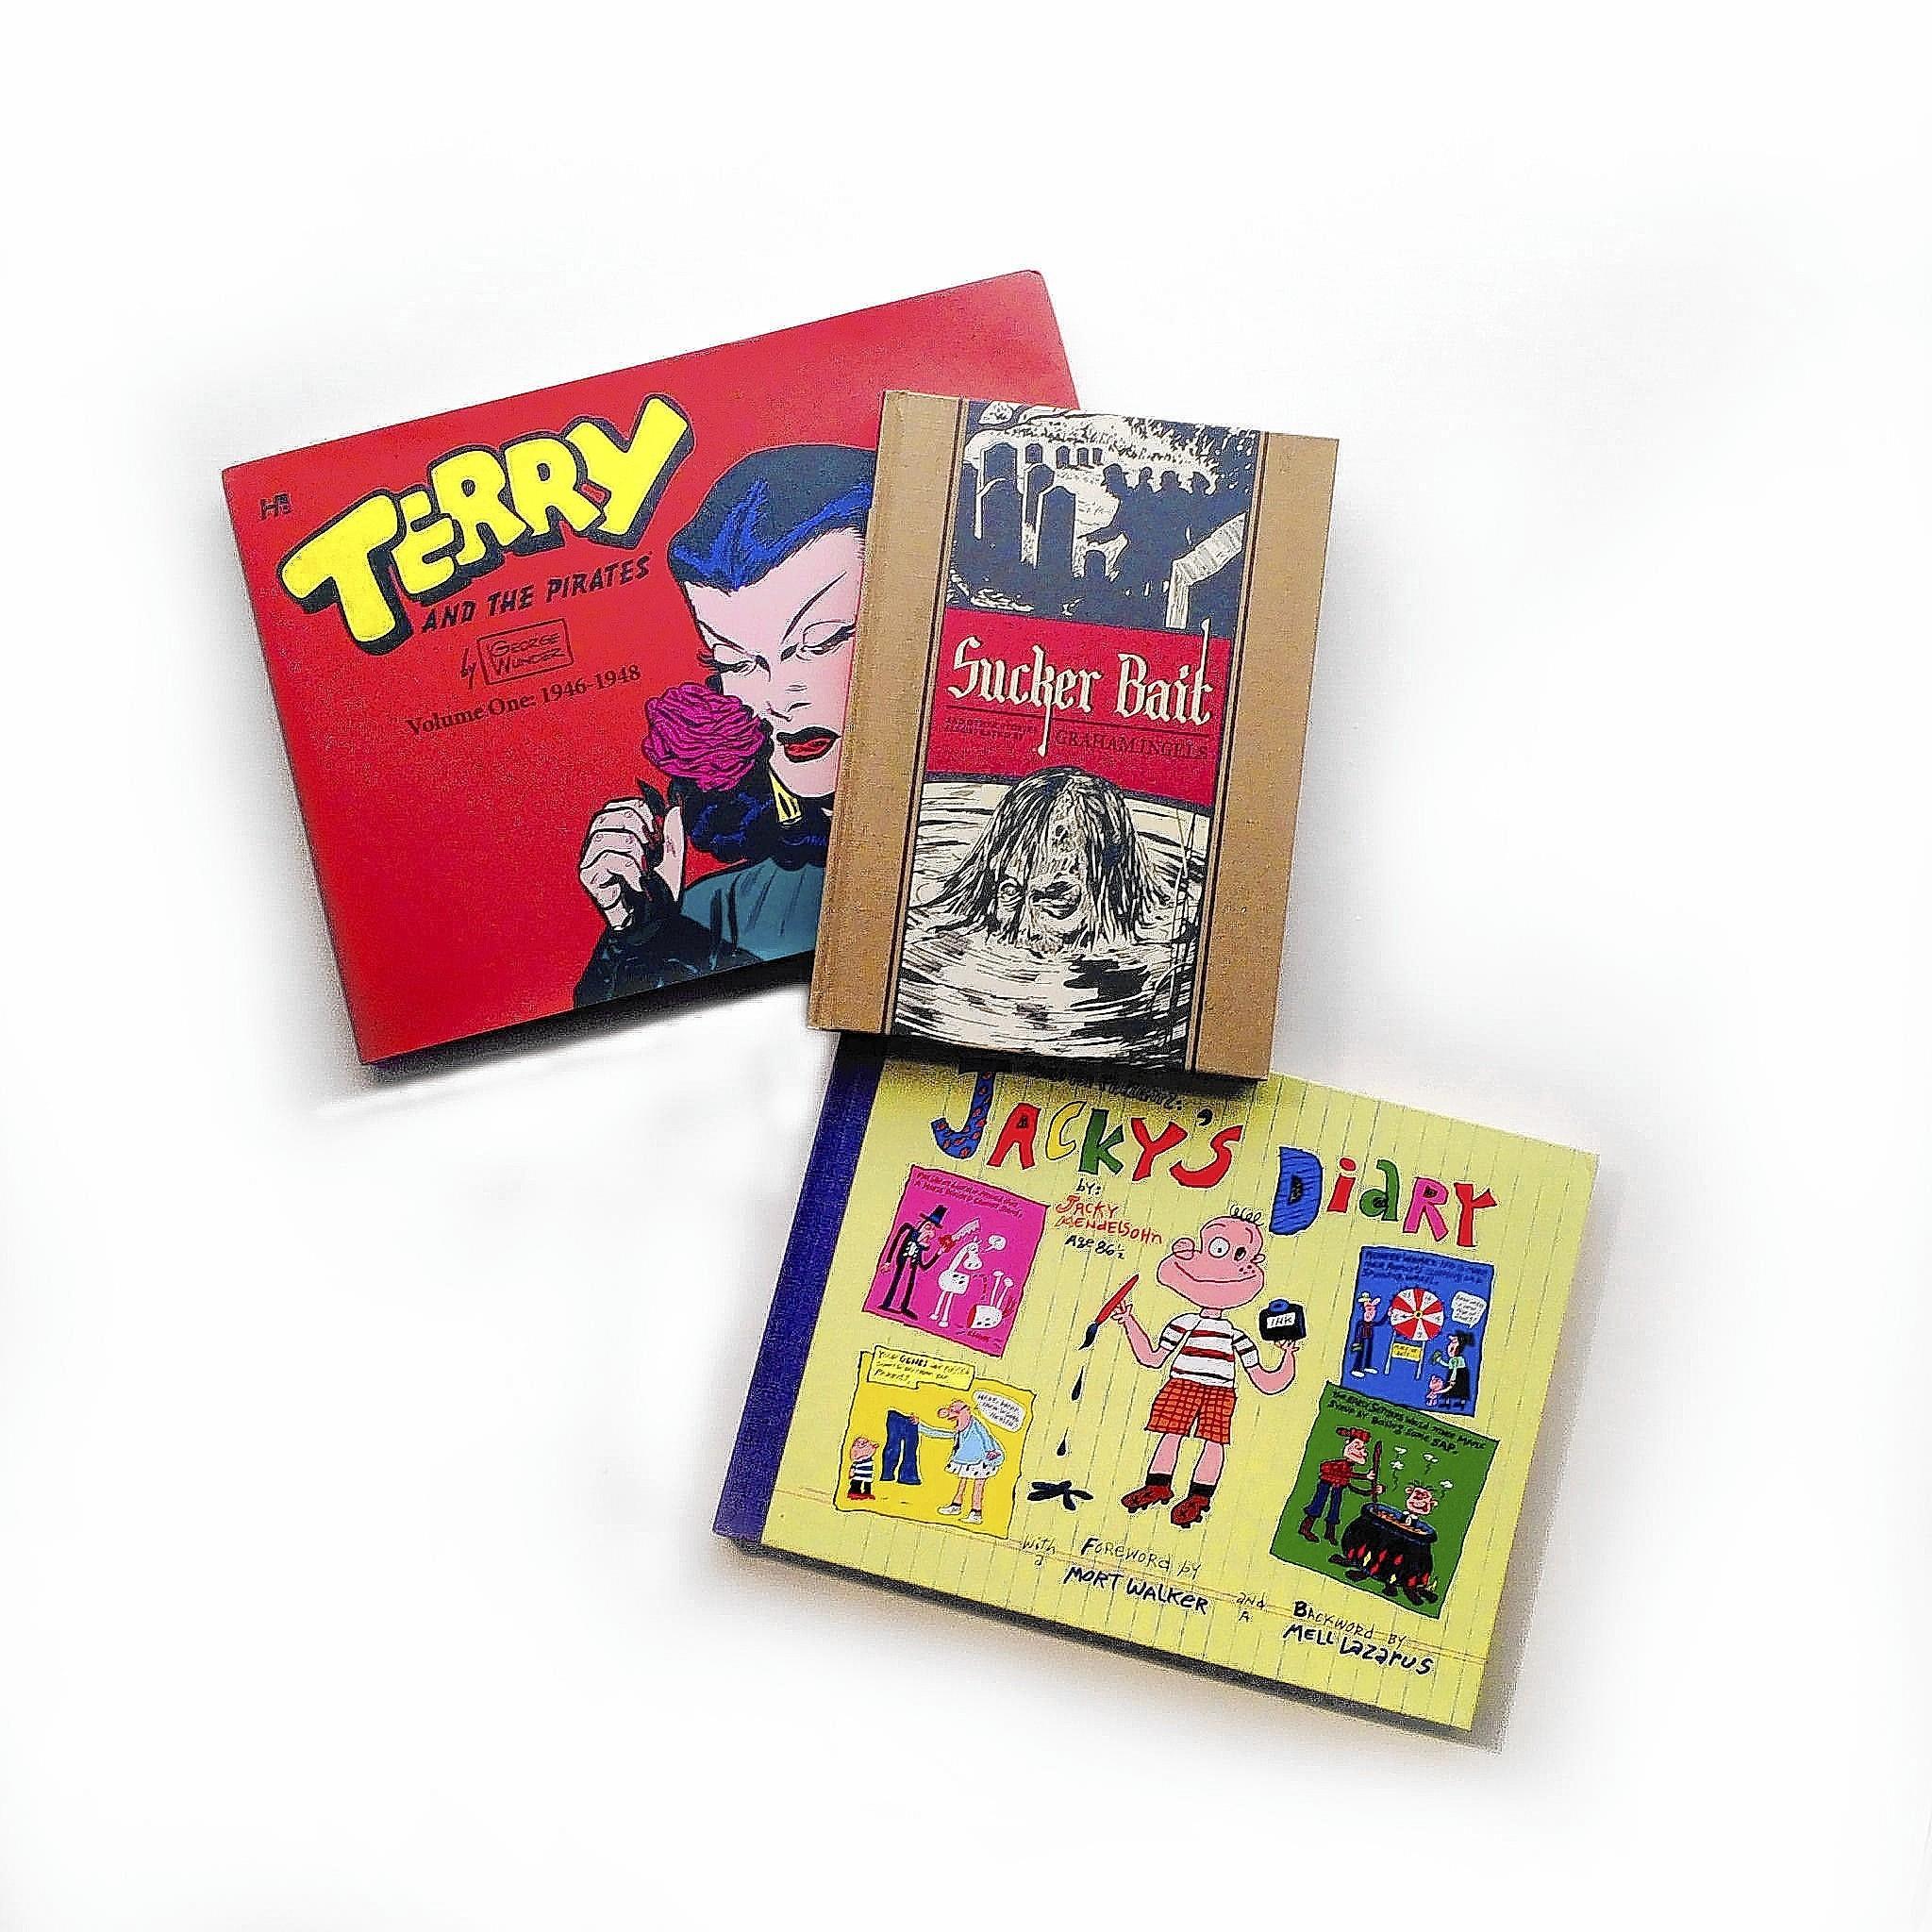 Comic book roundup: \'Jacky\'s Diary,\' more - tribunedigital ...